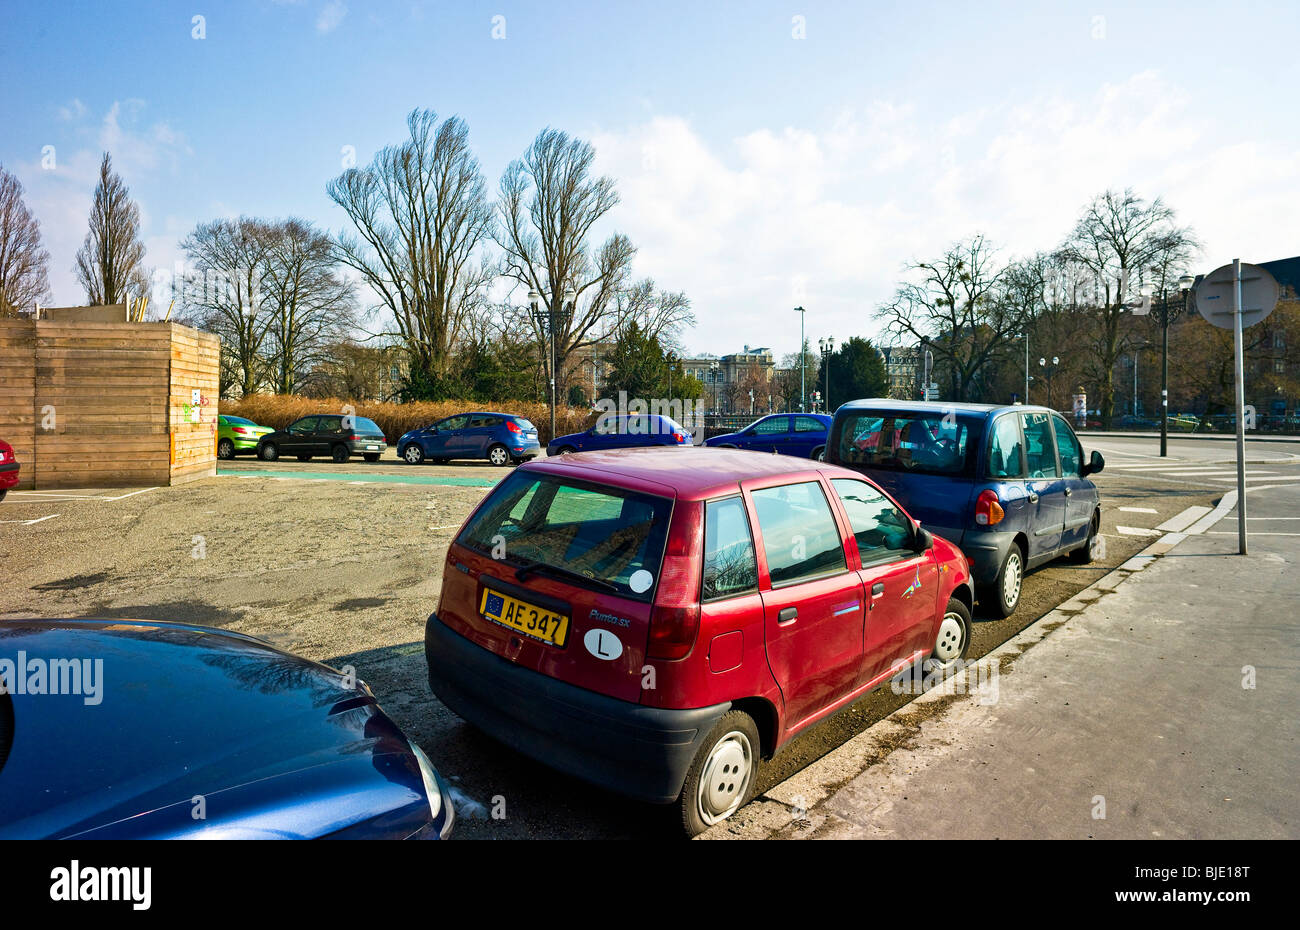 Parked cars, Strasbourg, Alsace, France - Stock Image